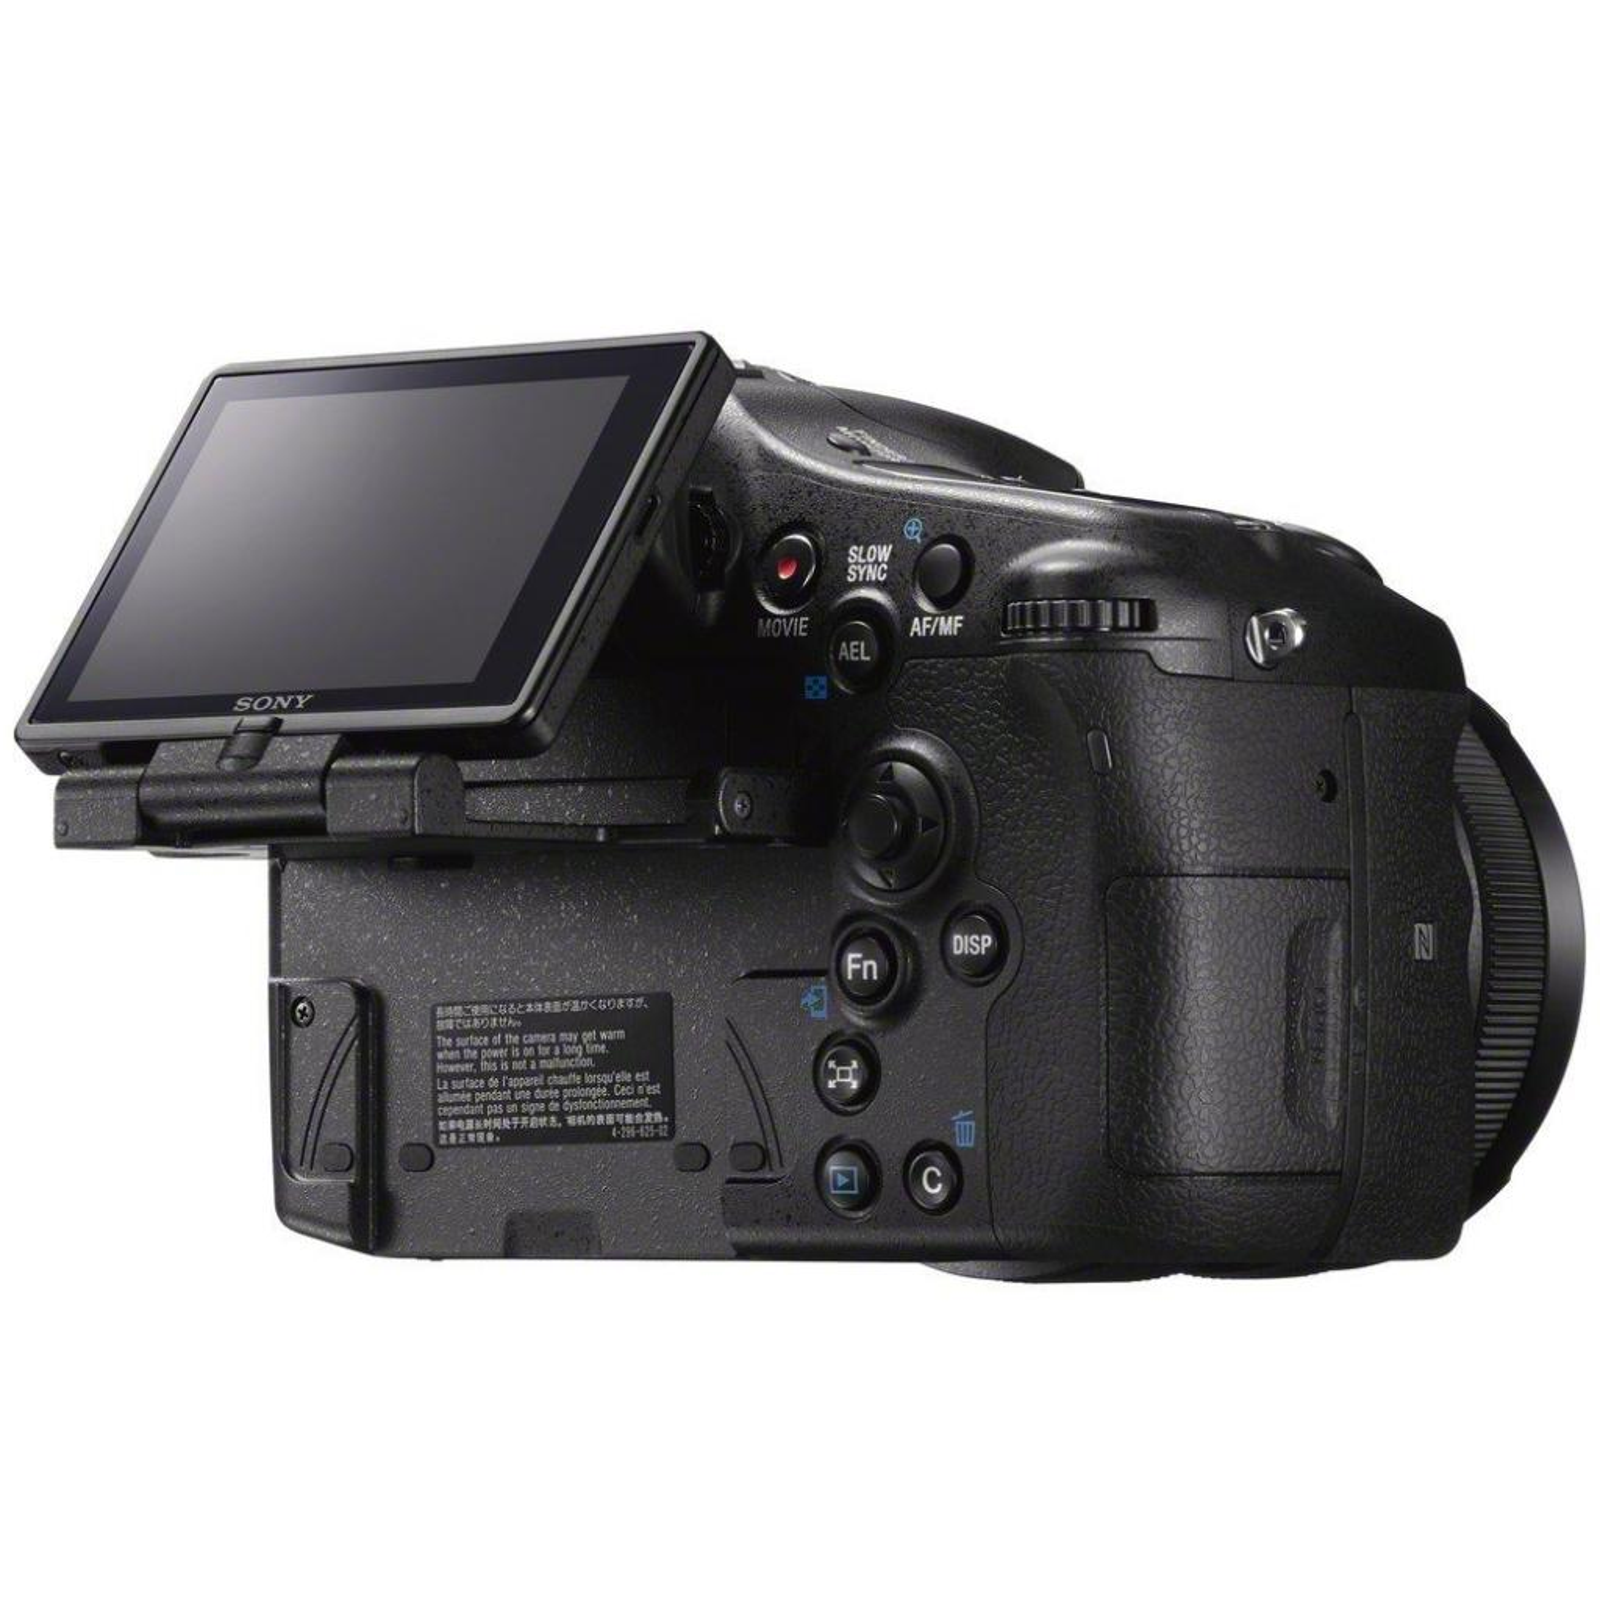 Цифровой фотоаппарат SONY Alpha 77M2 kit 16-50 f/2.8 black (ILCA77M2Q.CEC) изображение 5